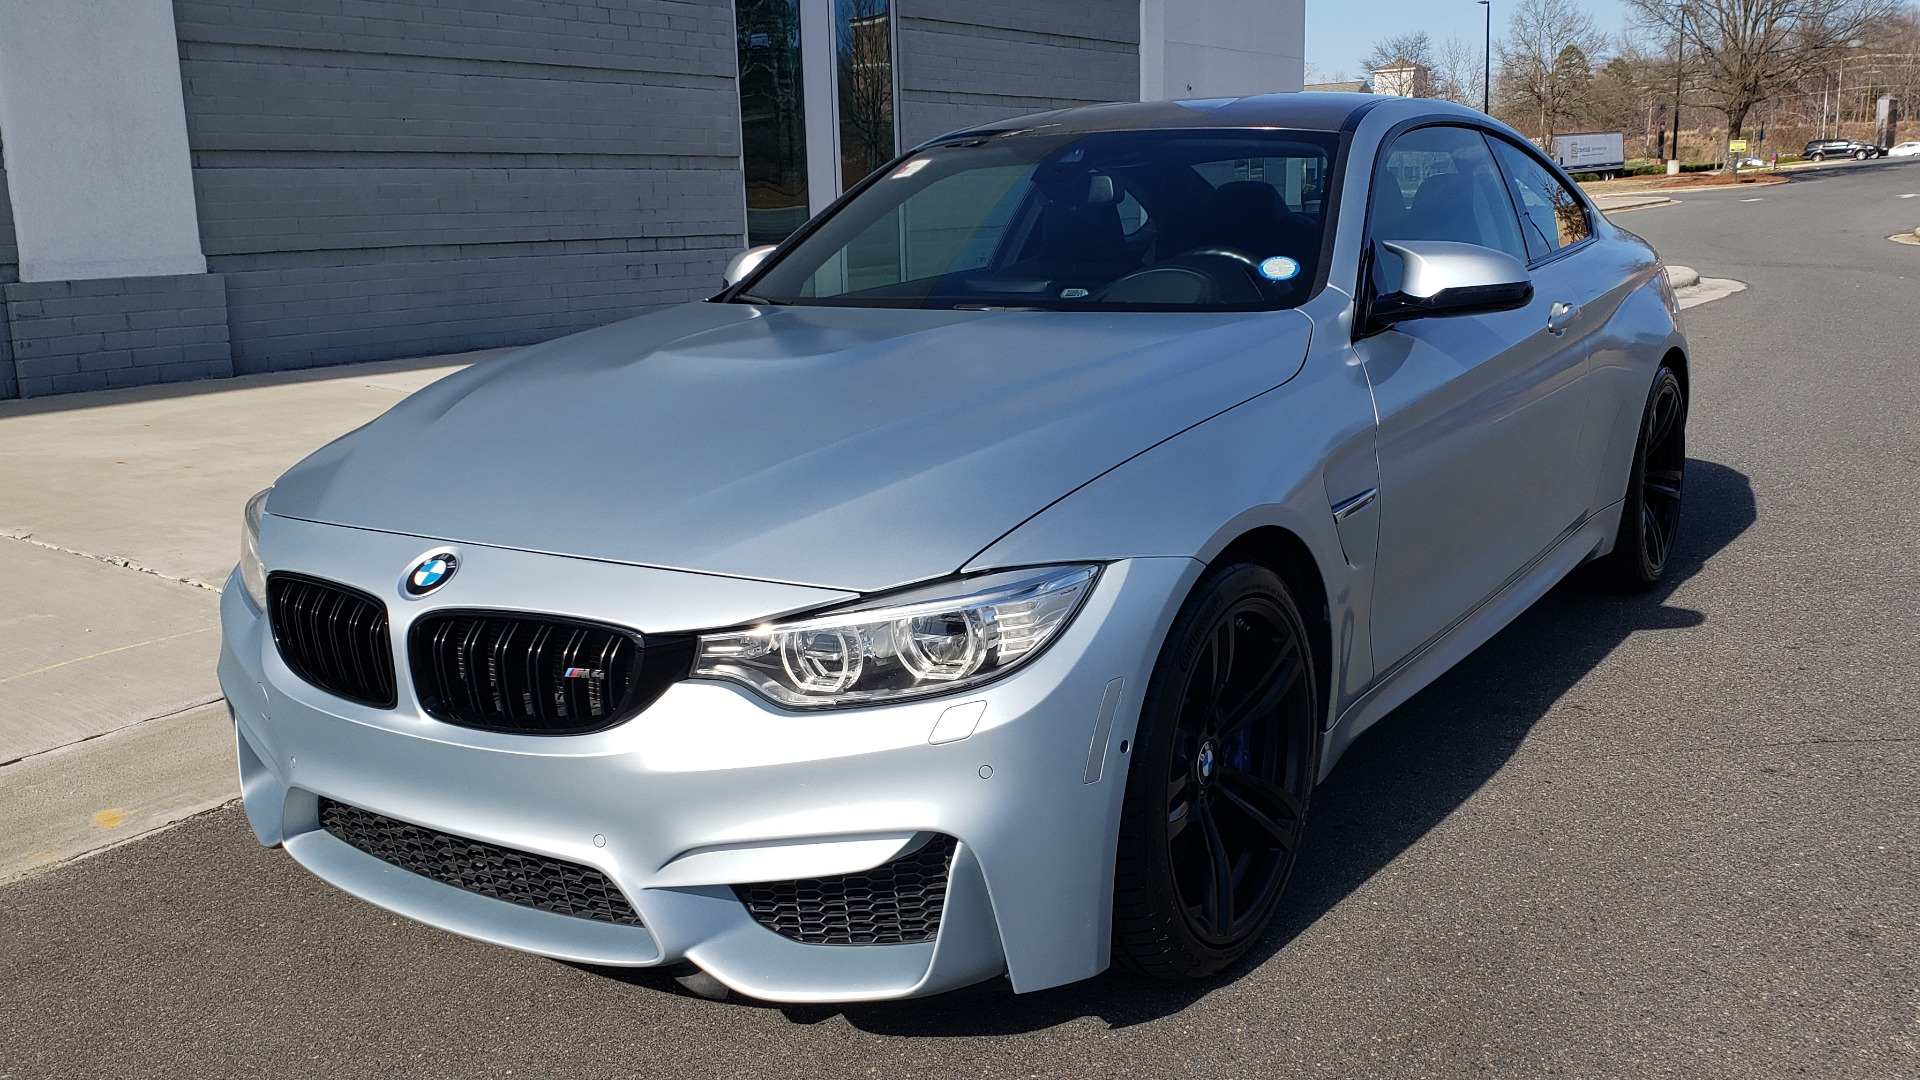 Used 2015 BMW M4 COUPE / EXEC PKG / DRVR ASST PLUS / LIGHTING / M-SUSPENSION for sale Sold at Formula Imports in Charlotte NC 28227 1